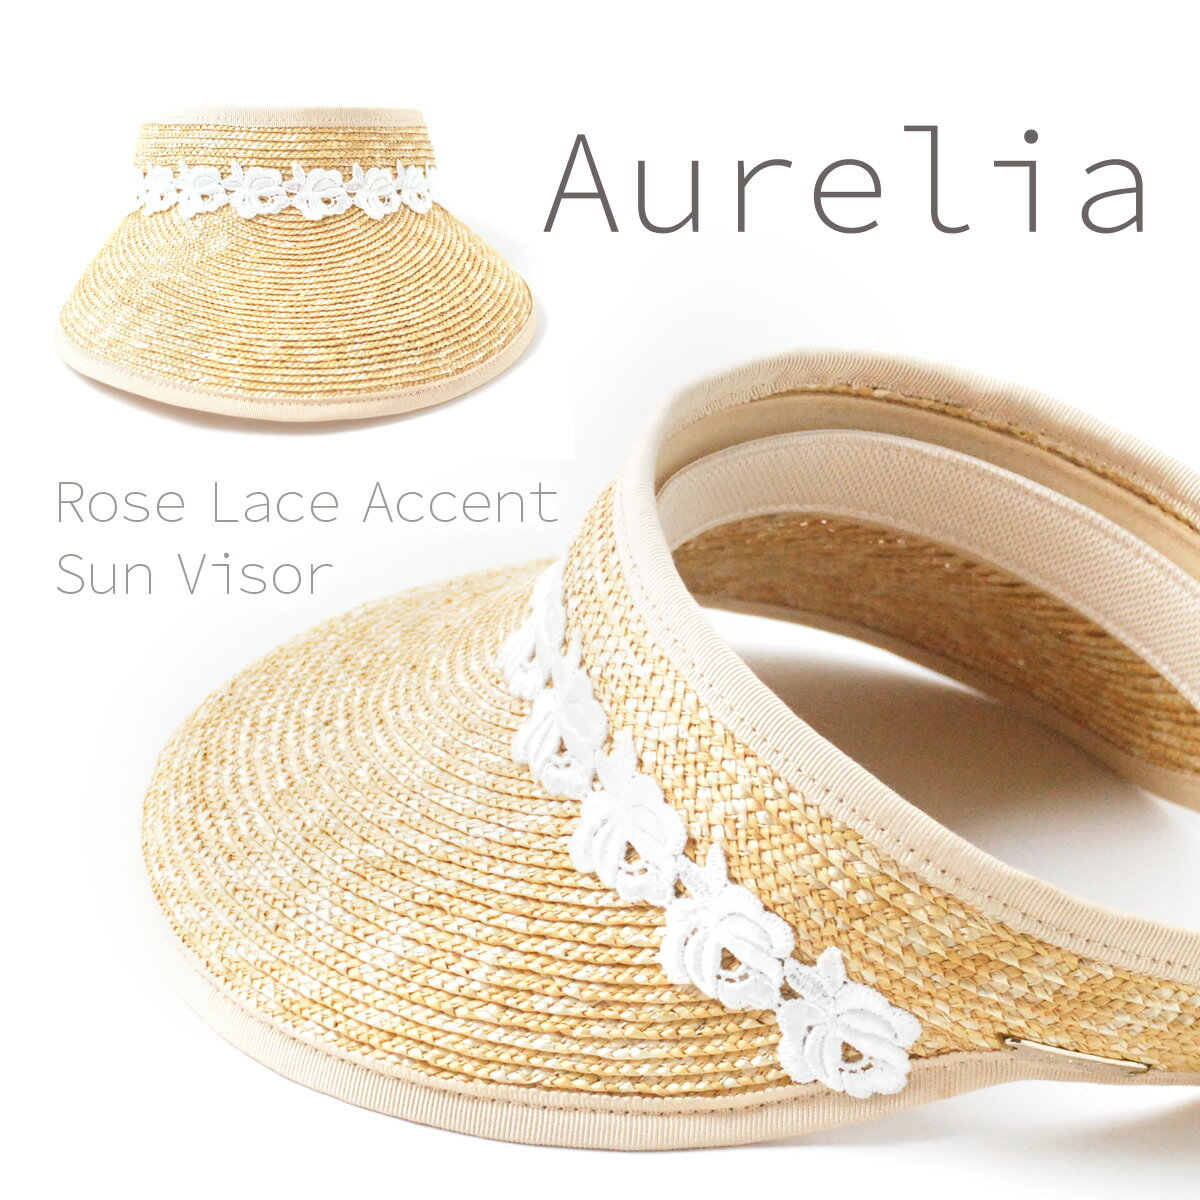 Aurelia ローズレースアクセントサンバイザー【日本製】【送料無料】 帽子 レディース 母の日 ギフト